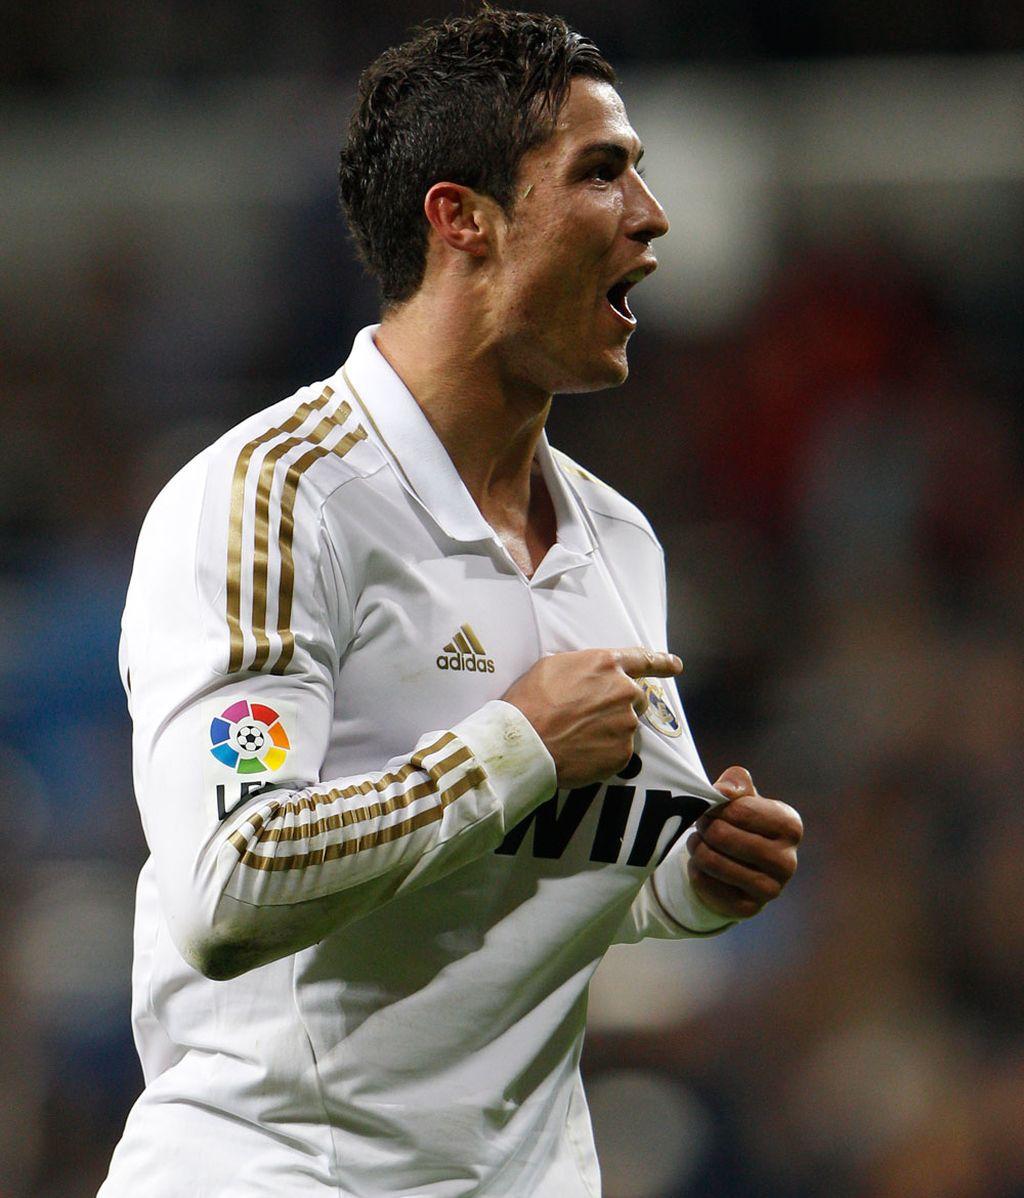 Cristiano Ronaldo celebra un gol señalando el escudo blanco